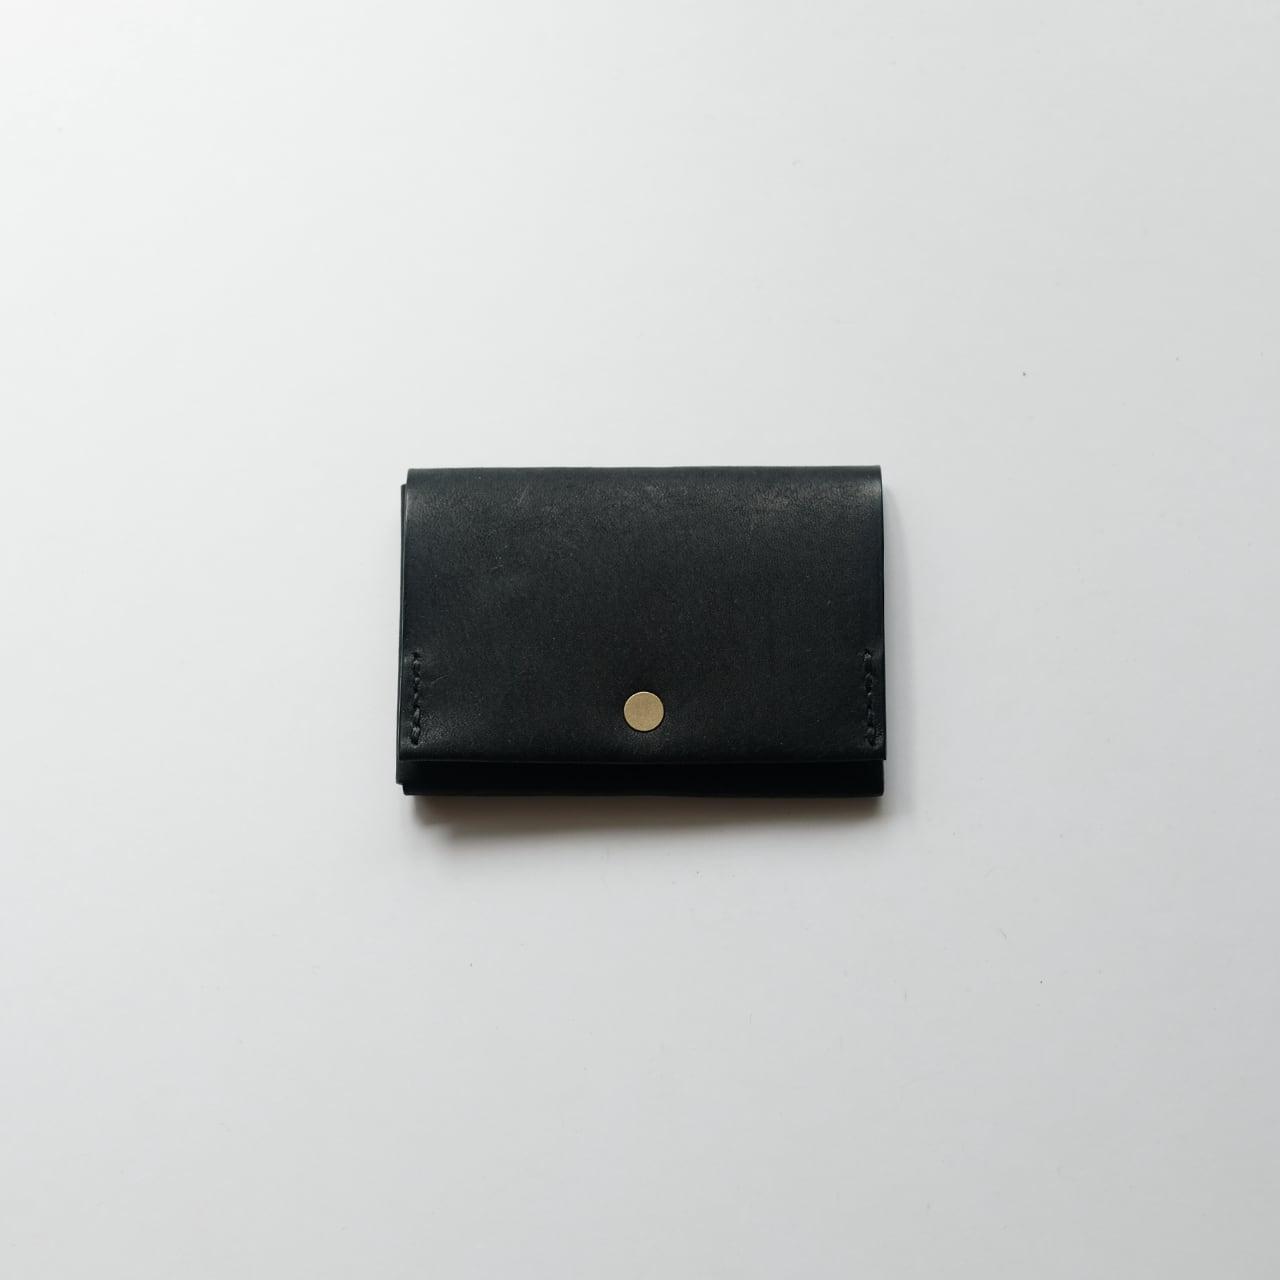 coinwallet - 02 - bk - プエブロ (old)